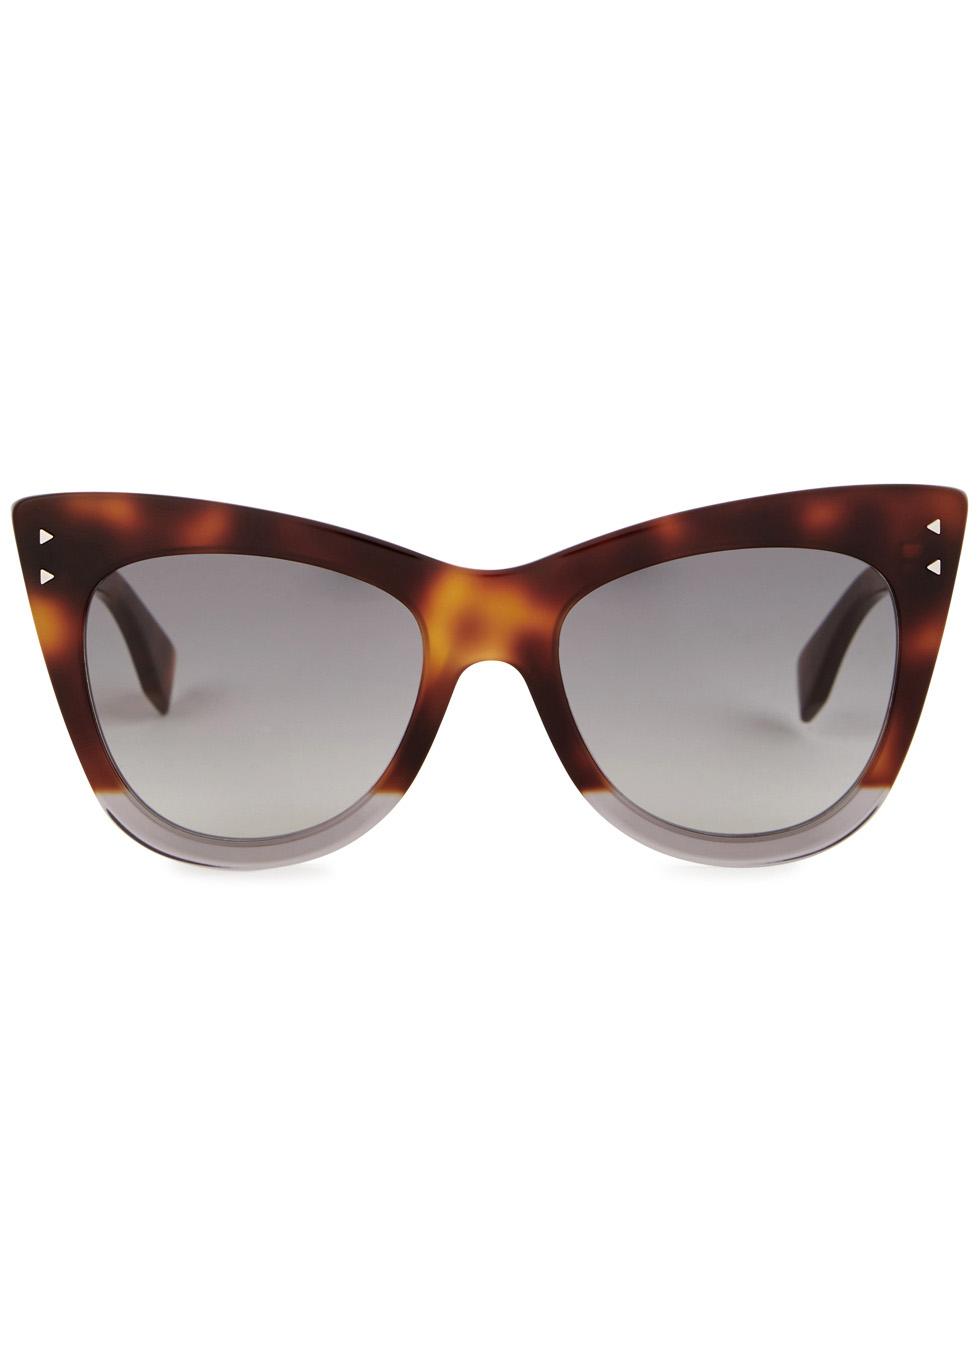 Tortoiseshell cat-eye sunglasses - Fendi